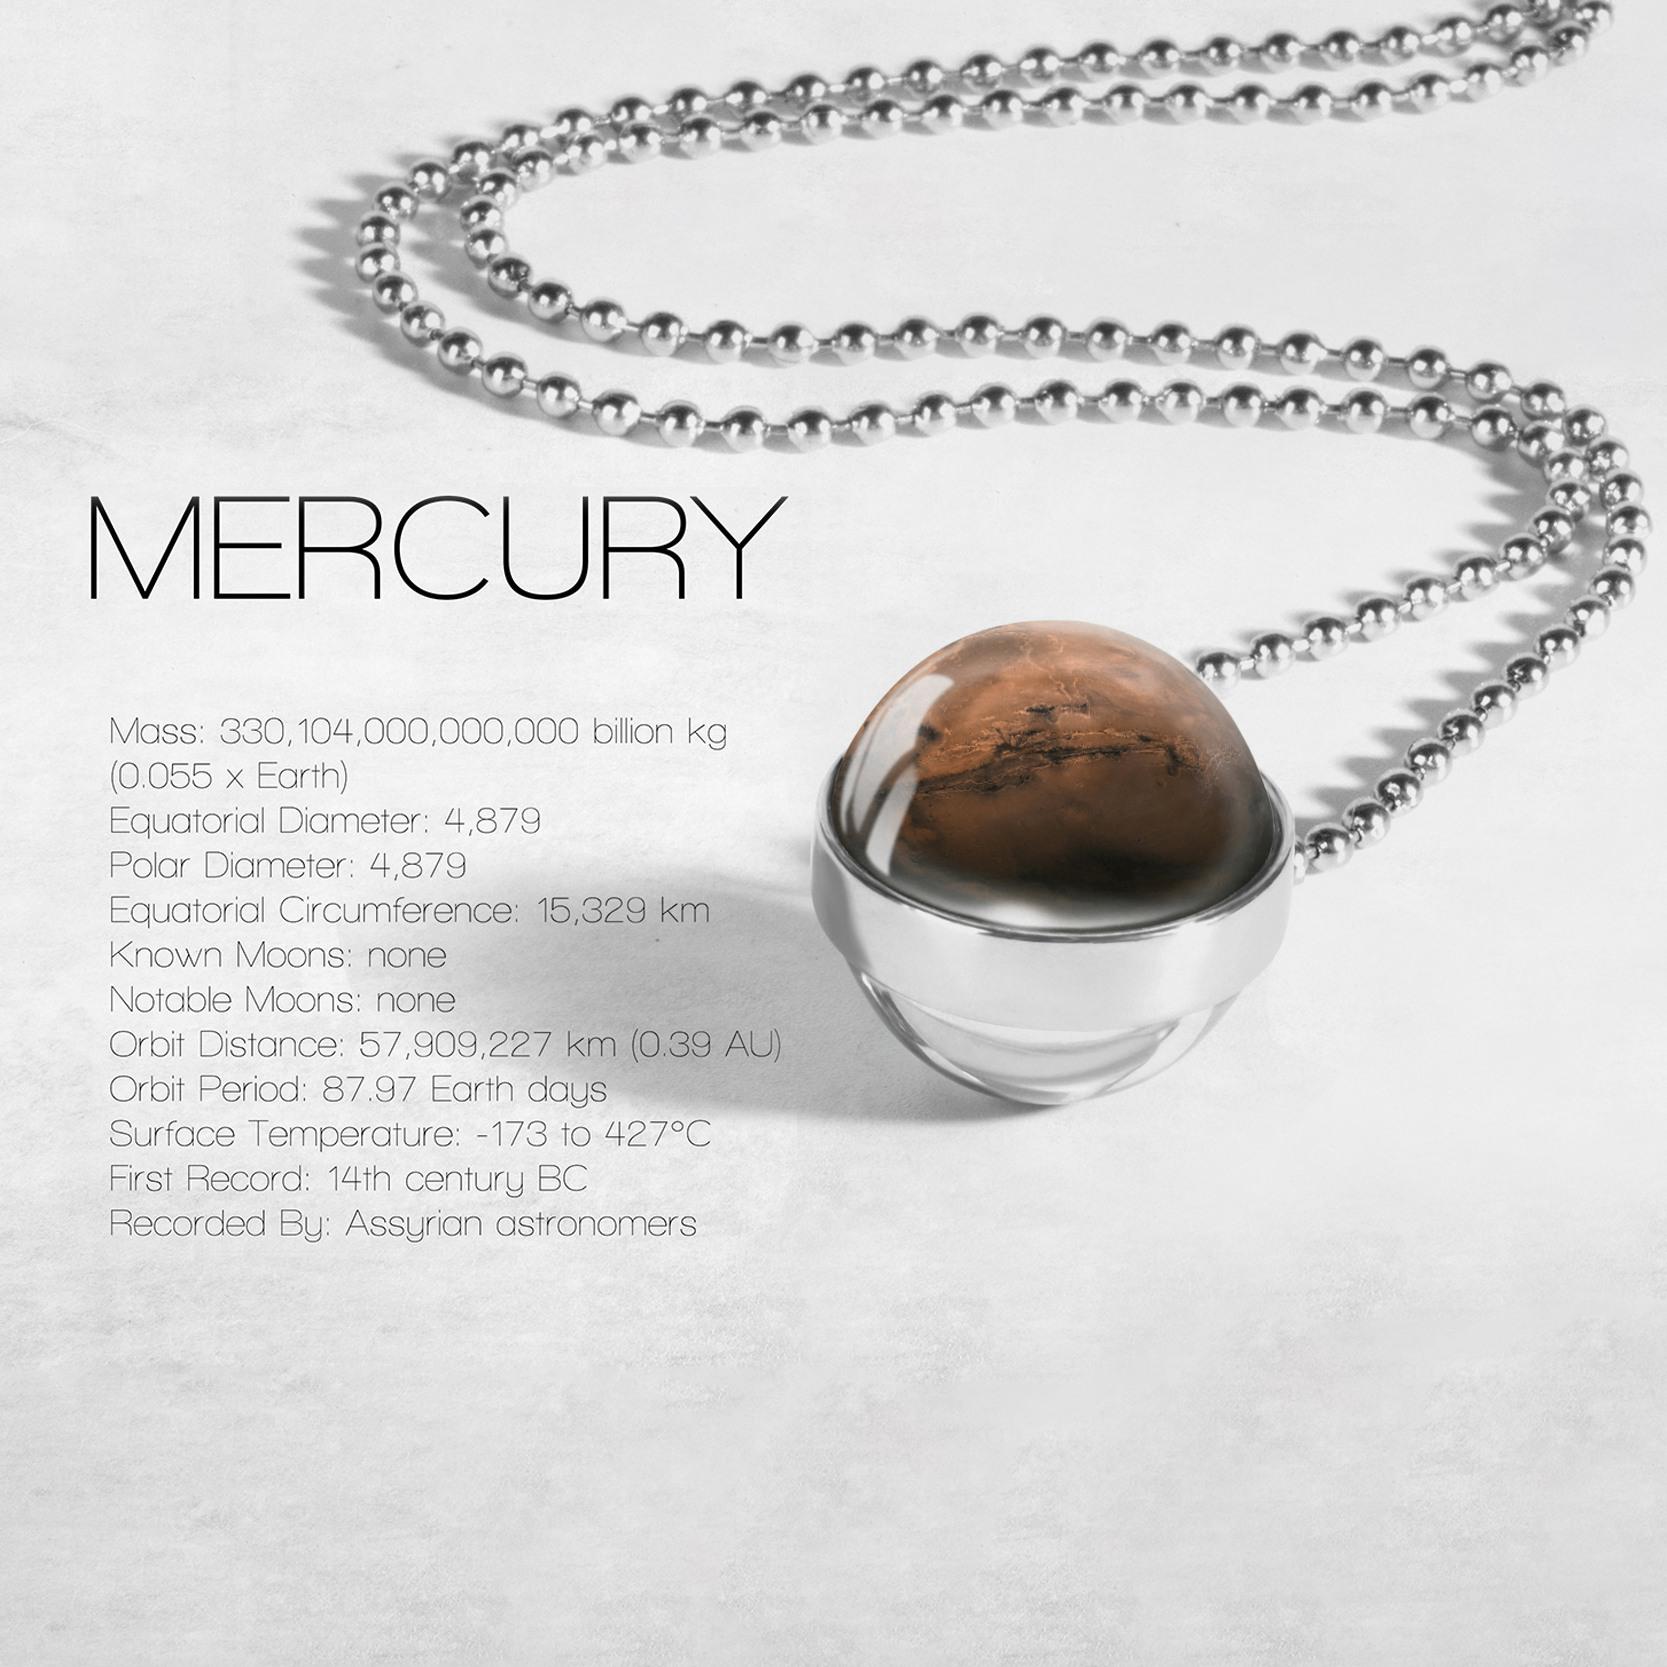 Globe Double Sided Necklace Solar System Planet Venus Mercury Mars Saturn Uranus Neptune Earth Sun Pendant Dome Glass Necklaces 6